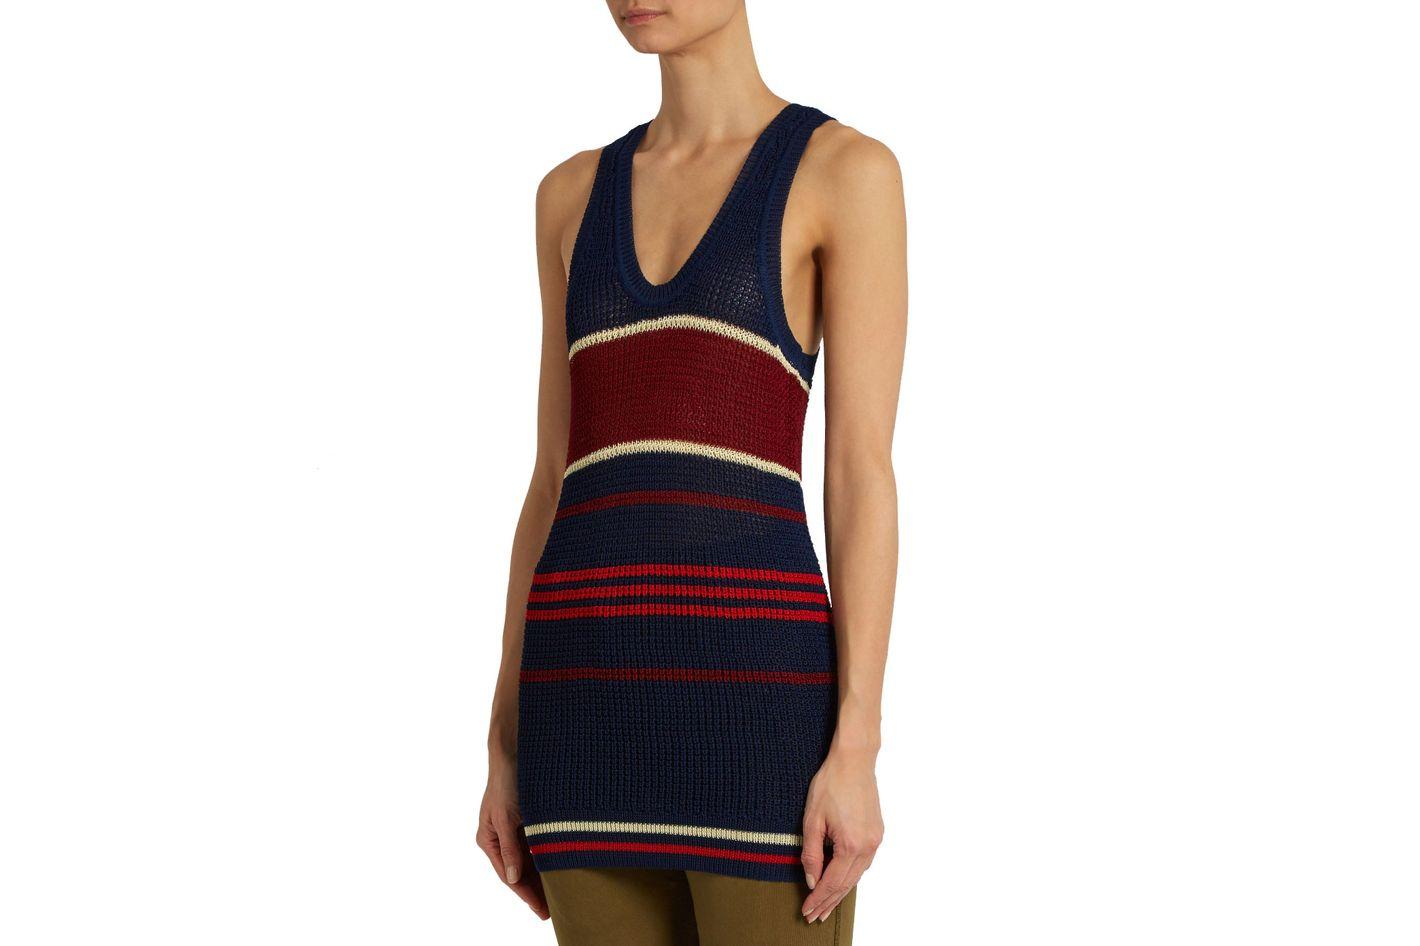 Isabel Marant Knit Tank Top